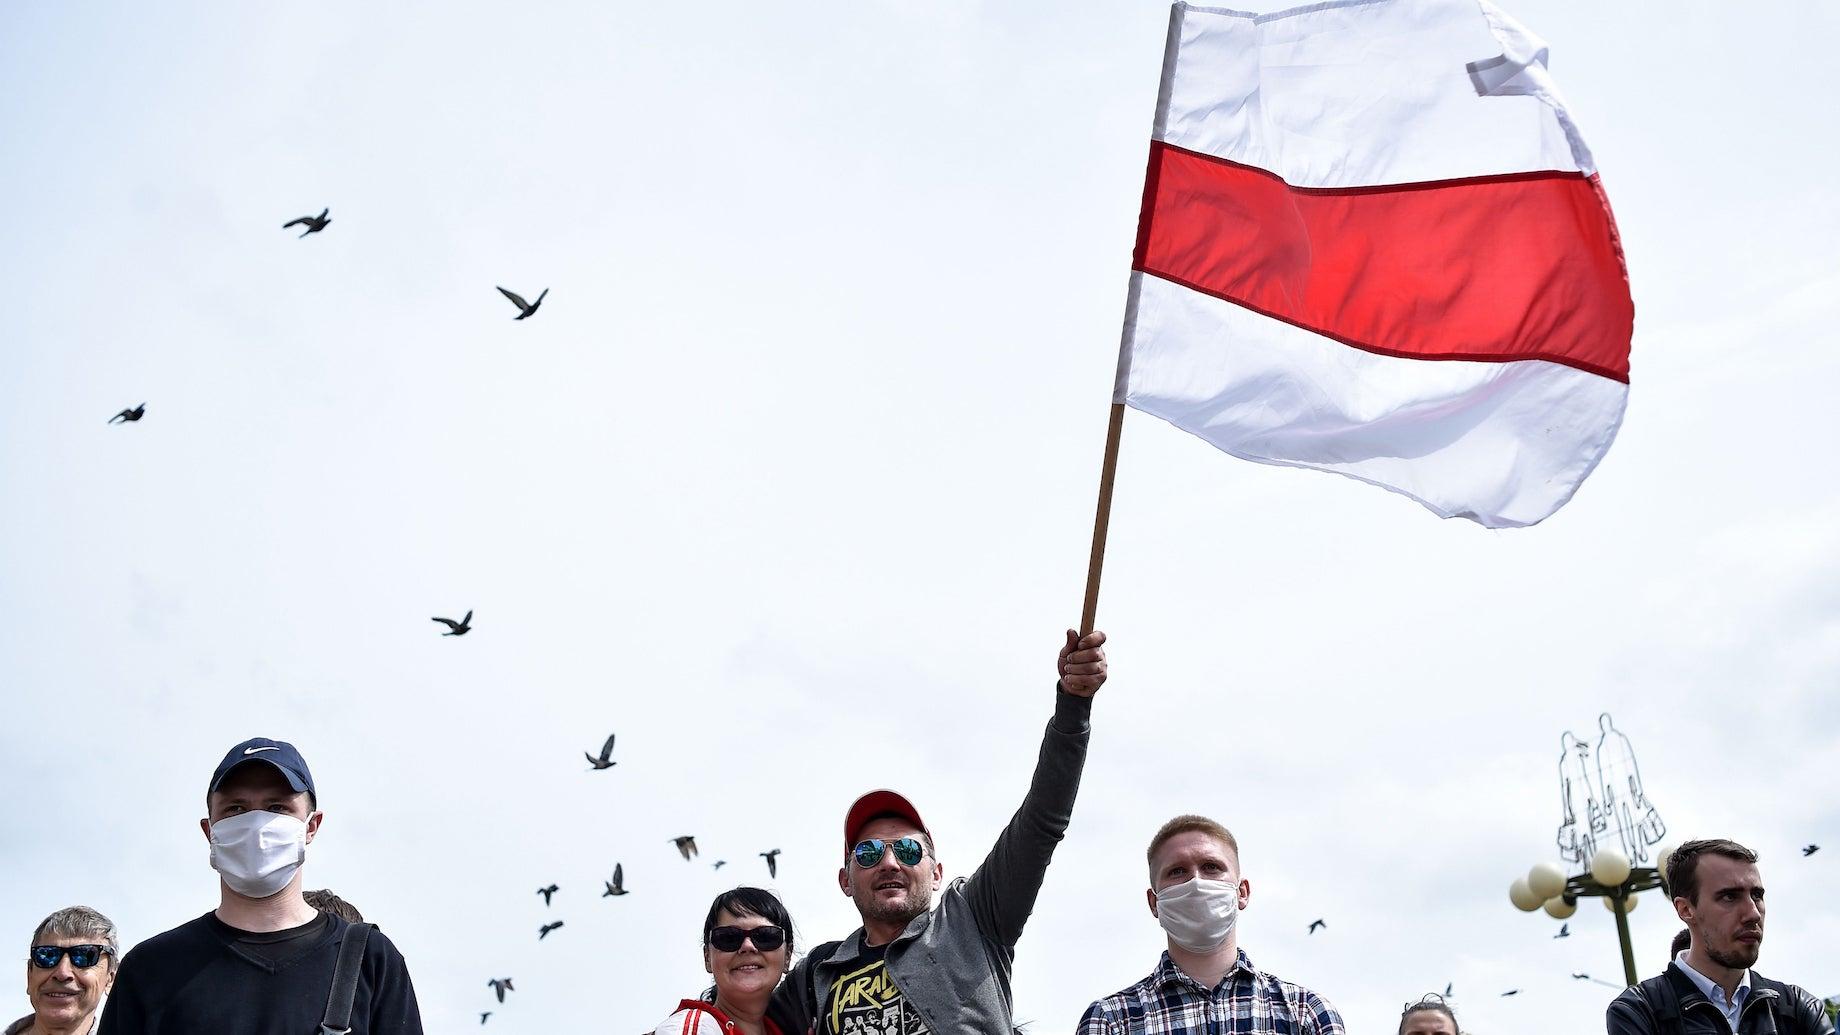 Belarus: Expert Report Calls for International Inquiry into Torture